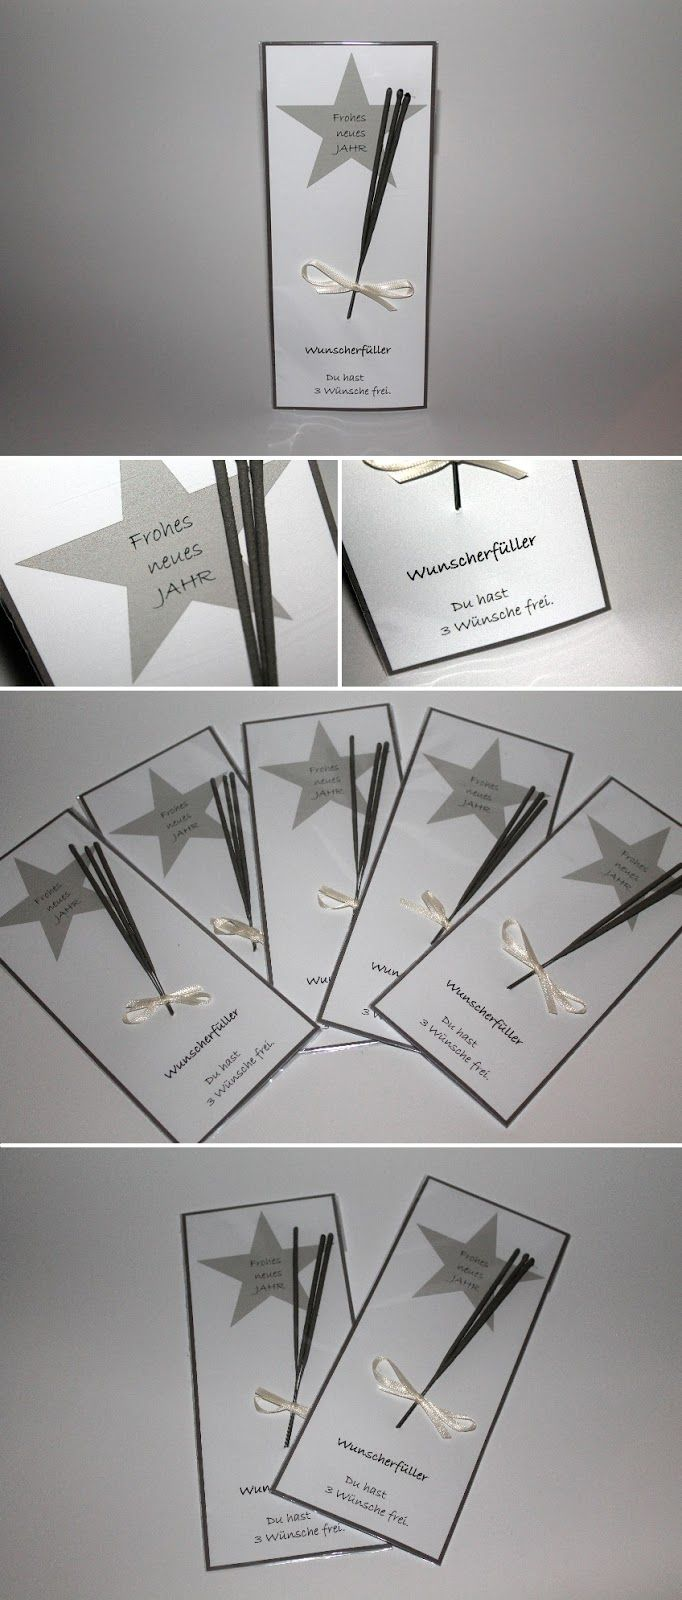 DIY Silvestergeschenk Wunscherfüller Wunderkerzen einfach selber machen #diyundselbermachen